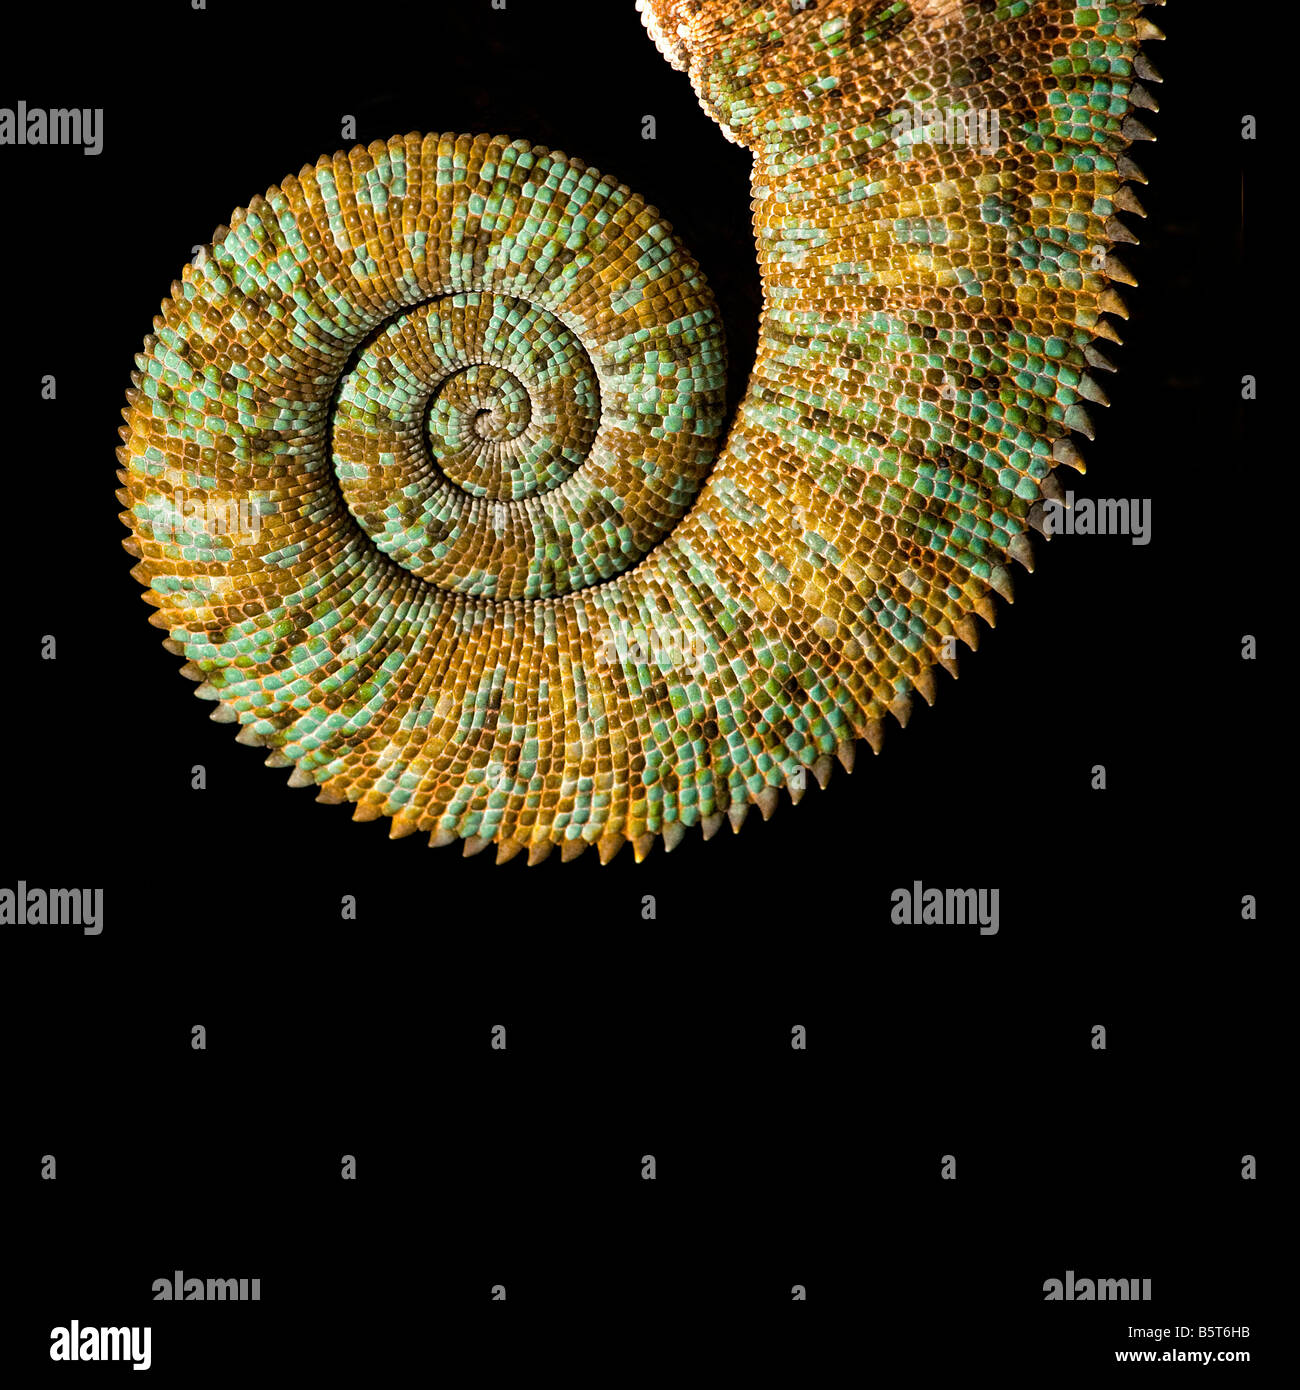 Male veiled or Yemen chameleon Chamaeleo catytratus coiled tail - Stock Image